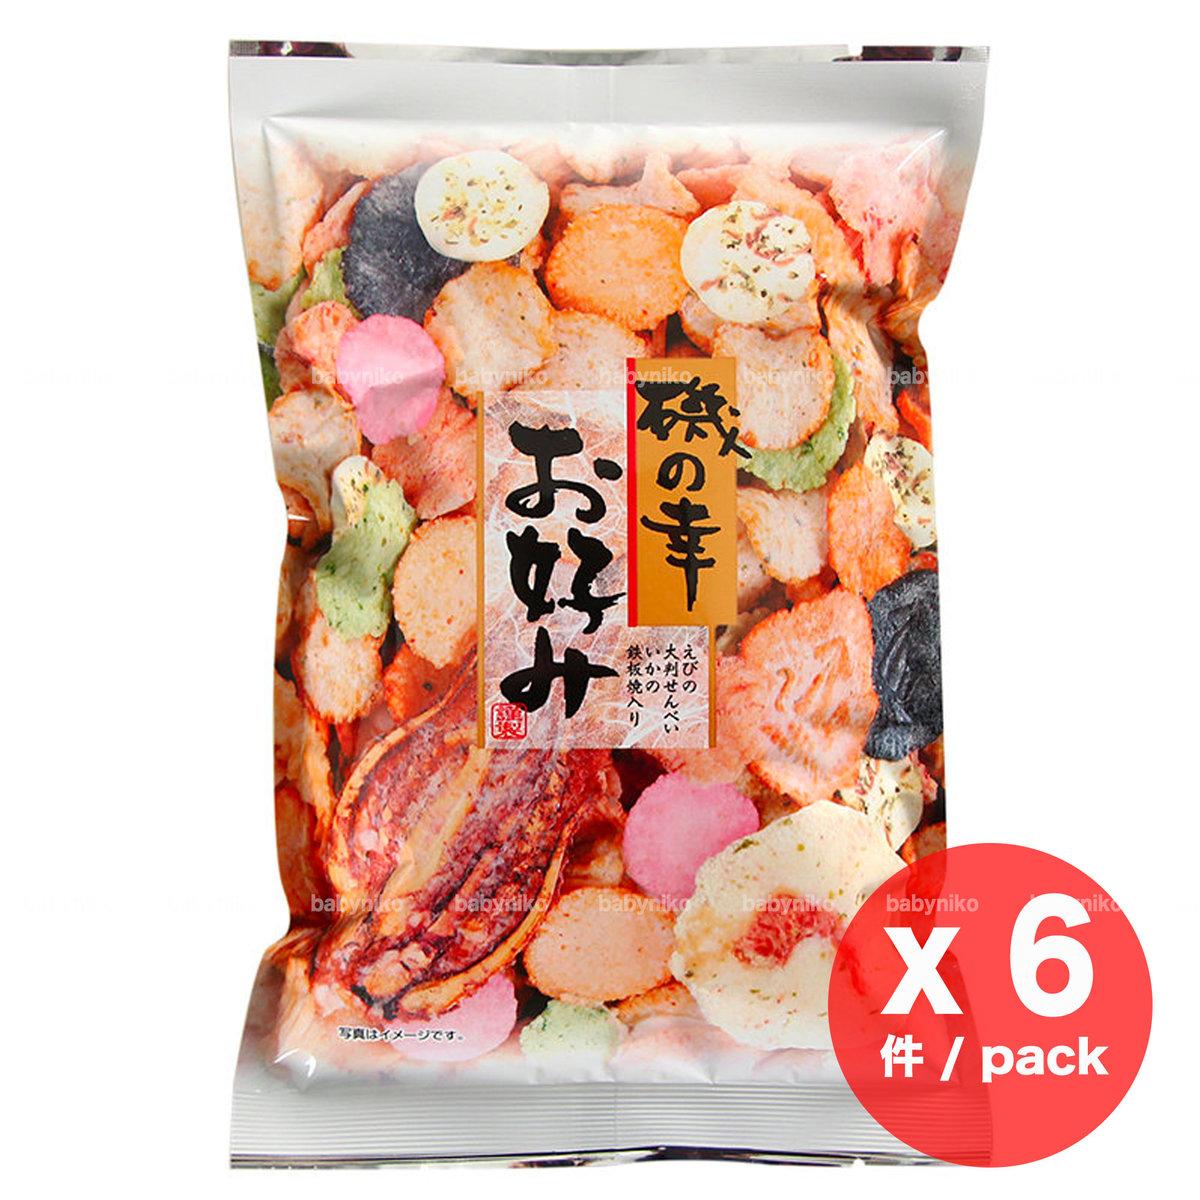 IKEDA   IKEDA Mix rice cake seafood favour x 6 pack   HKTVmall